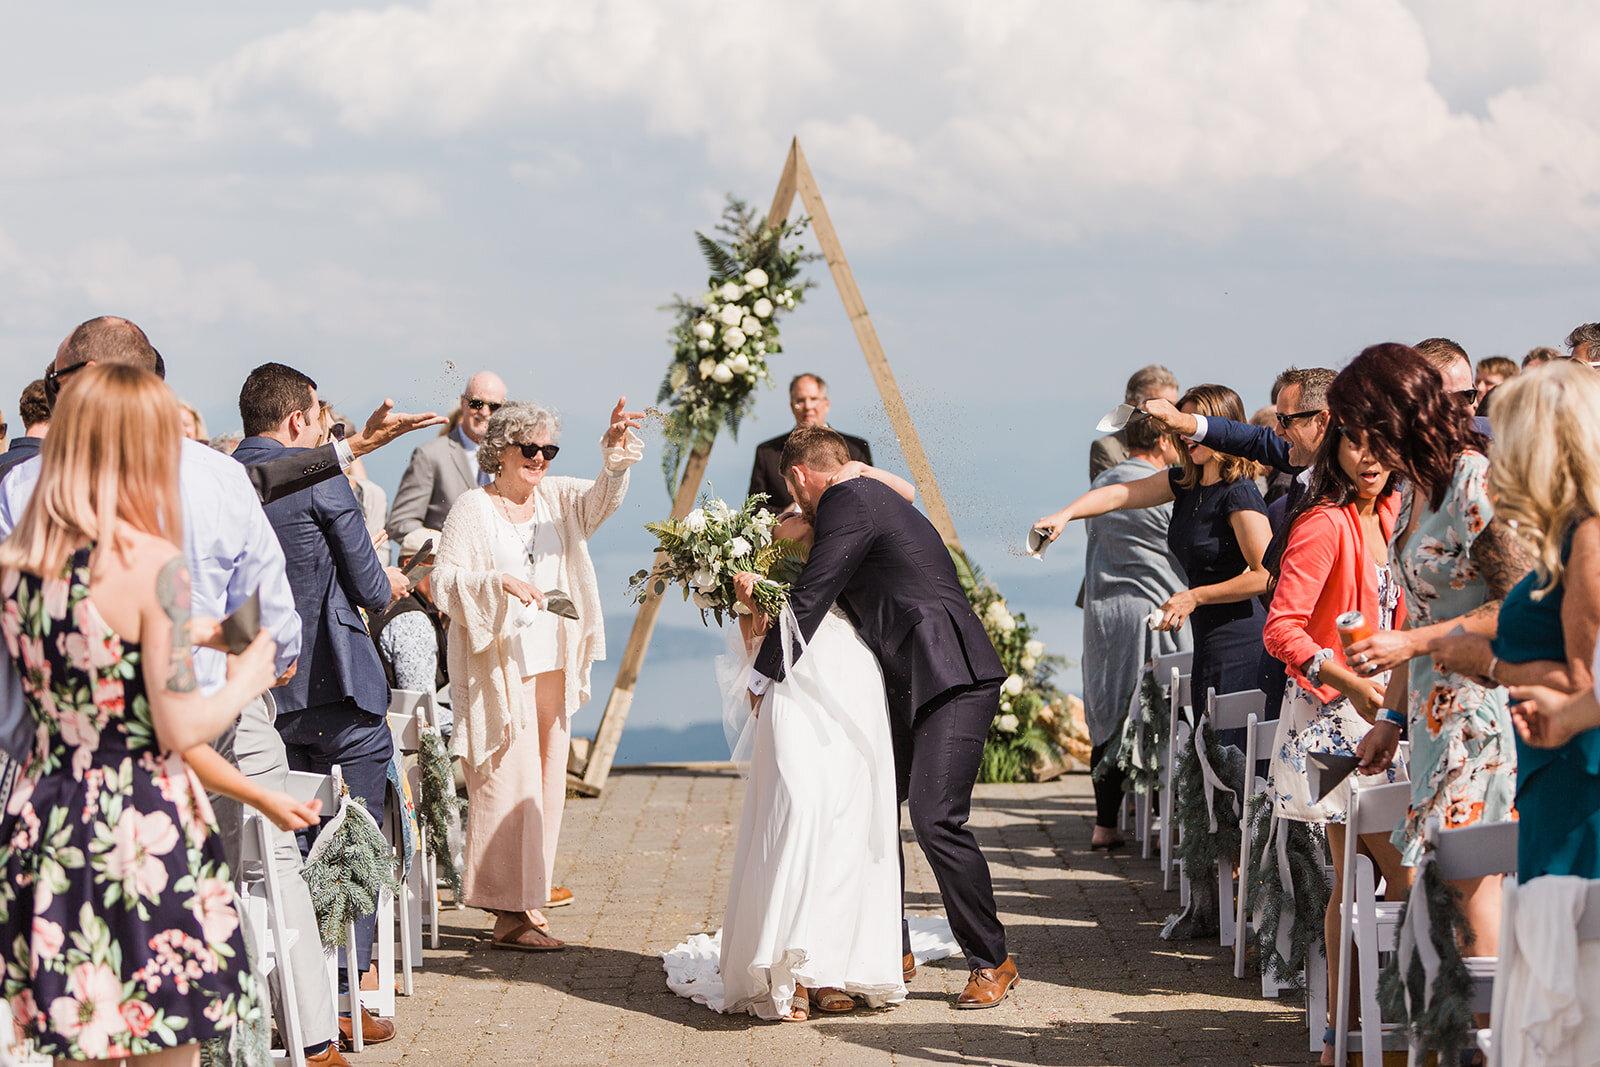 bride and groom down the aisle spokane weddin gkiss